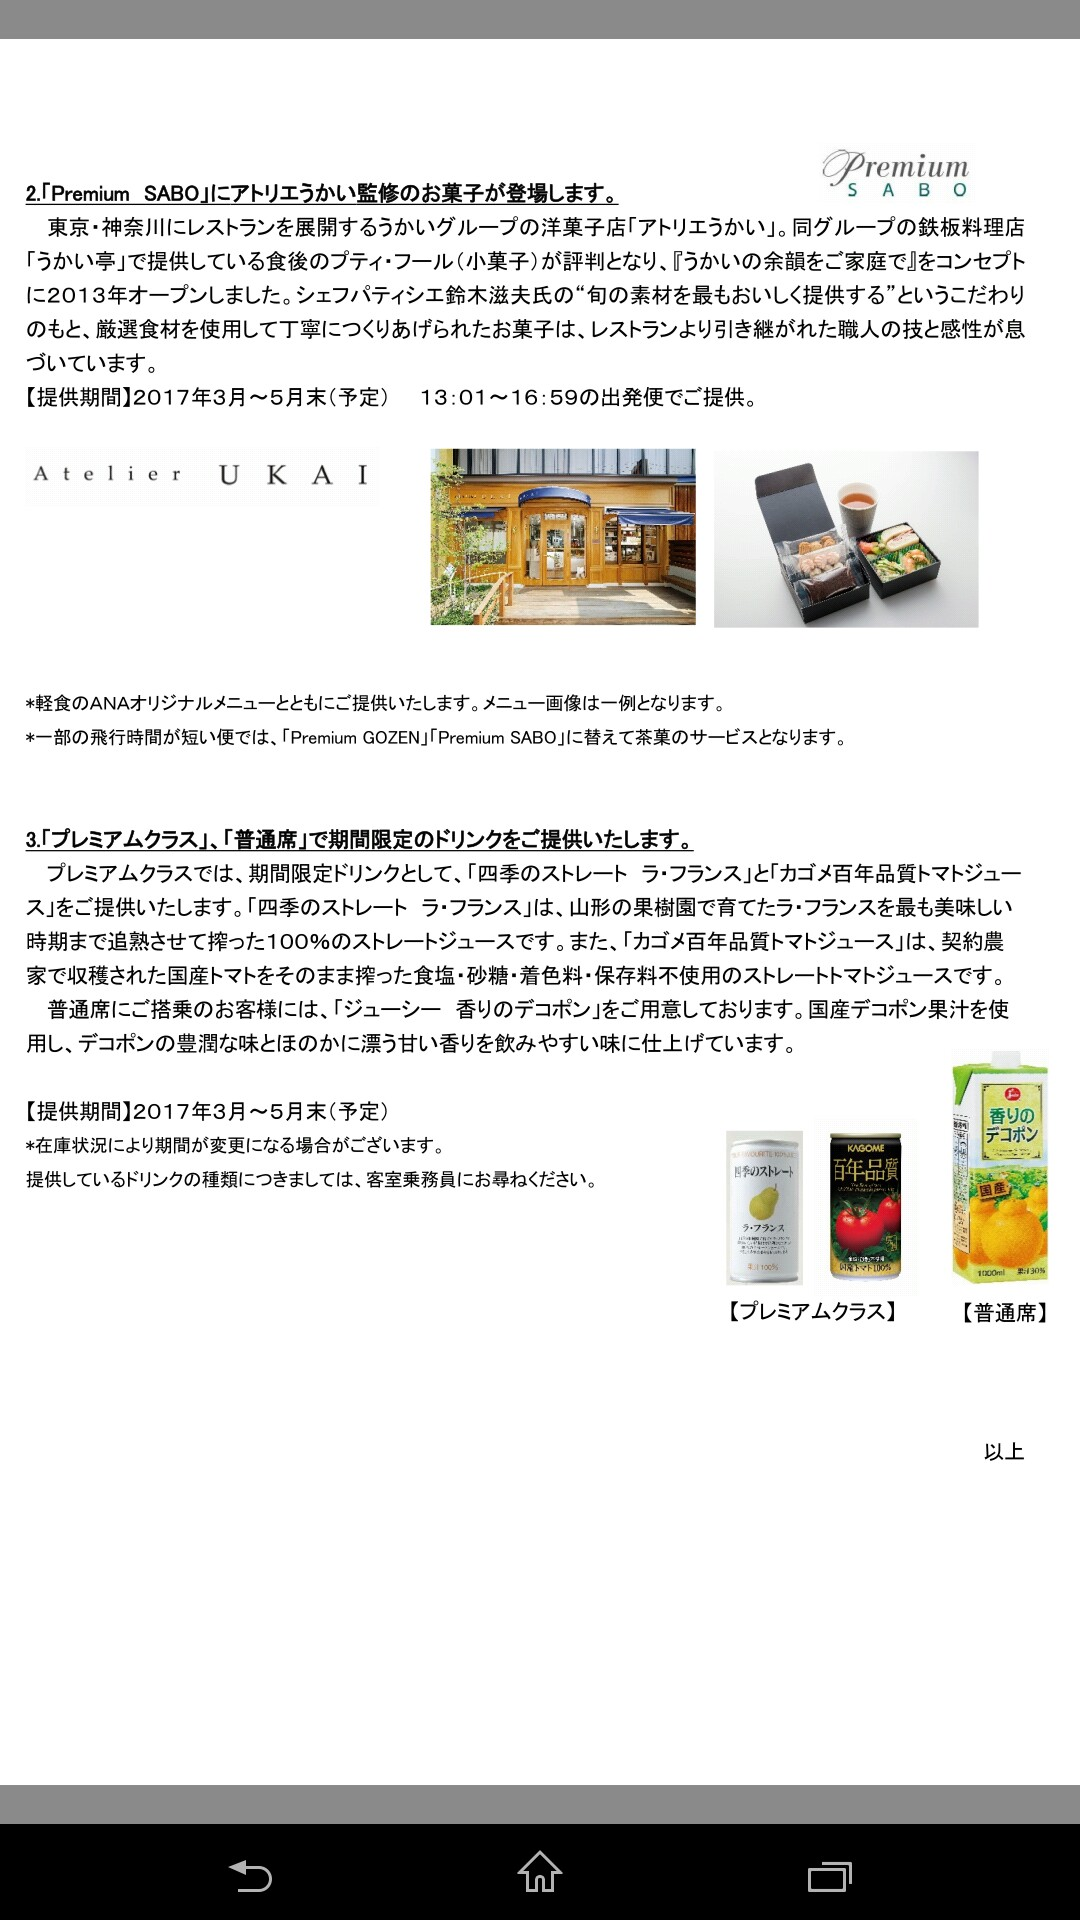 f:id:yoshiki808:20170227220638j:plain